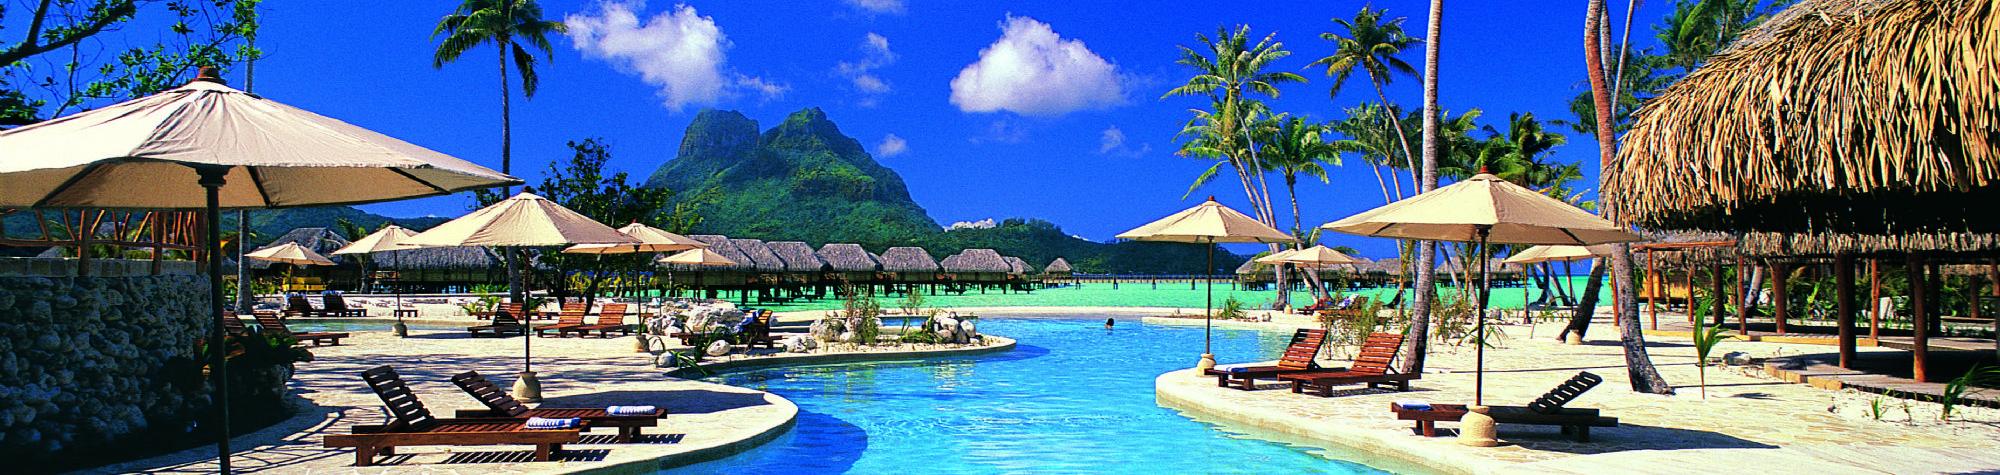 Bora bora pearl beach resort  spa is a luxury beachfront hotel on the bora bora island